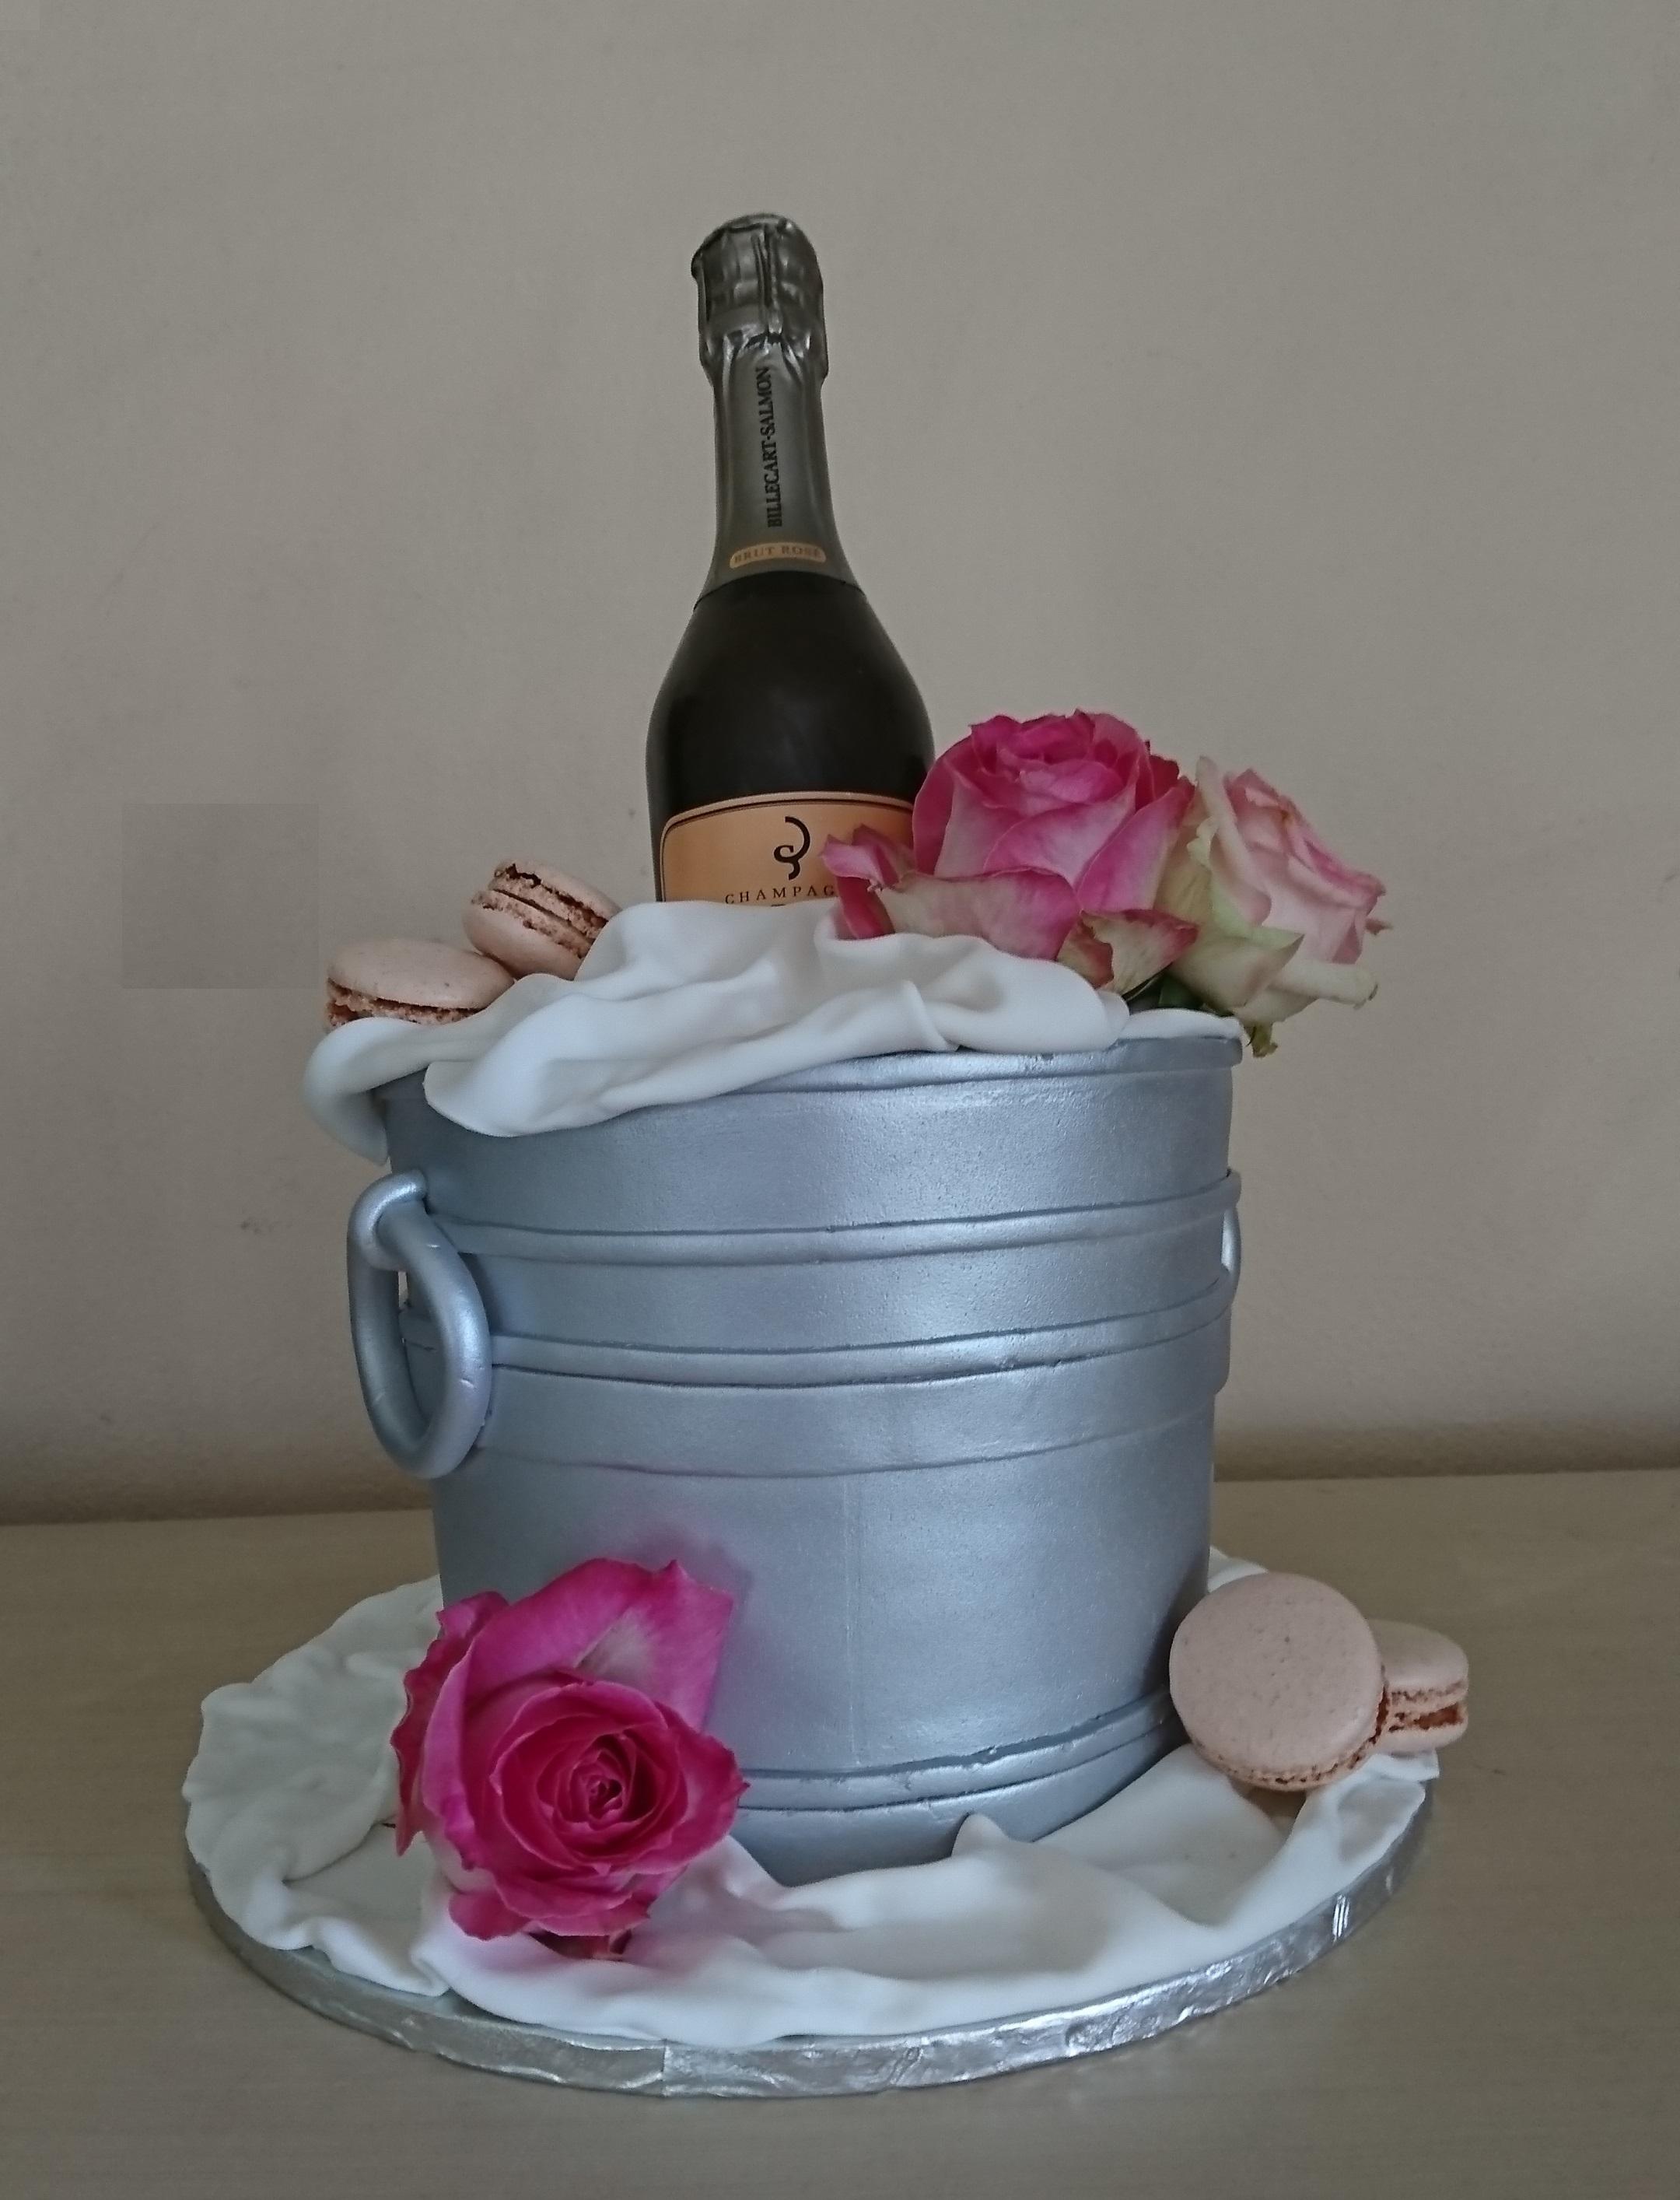 Champagne Bucket 1